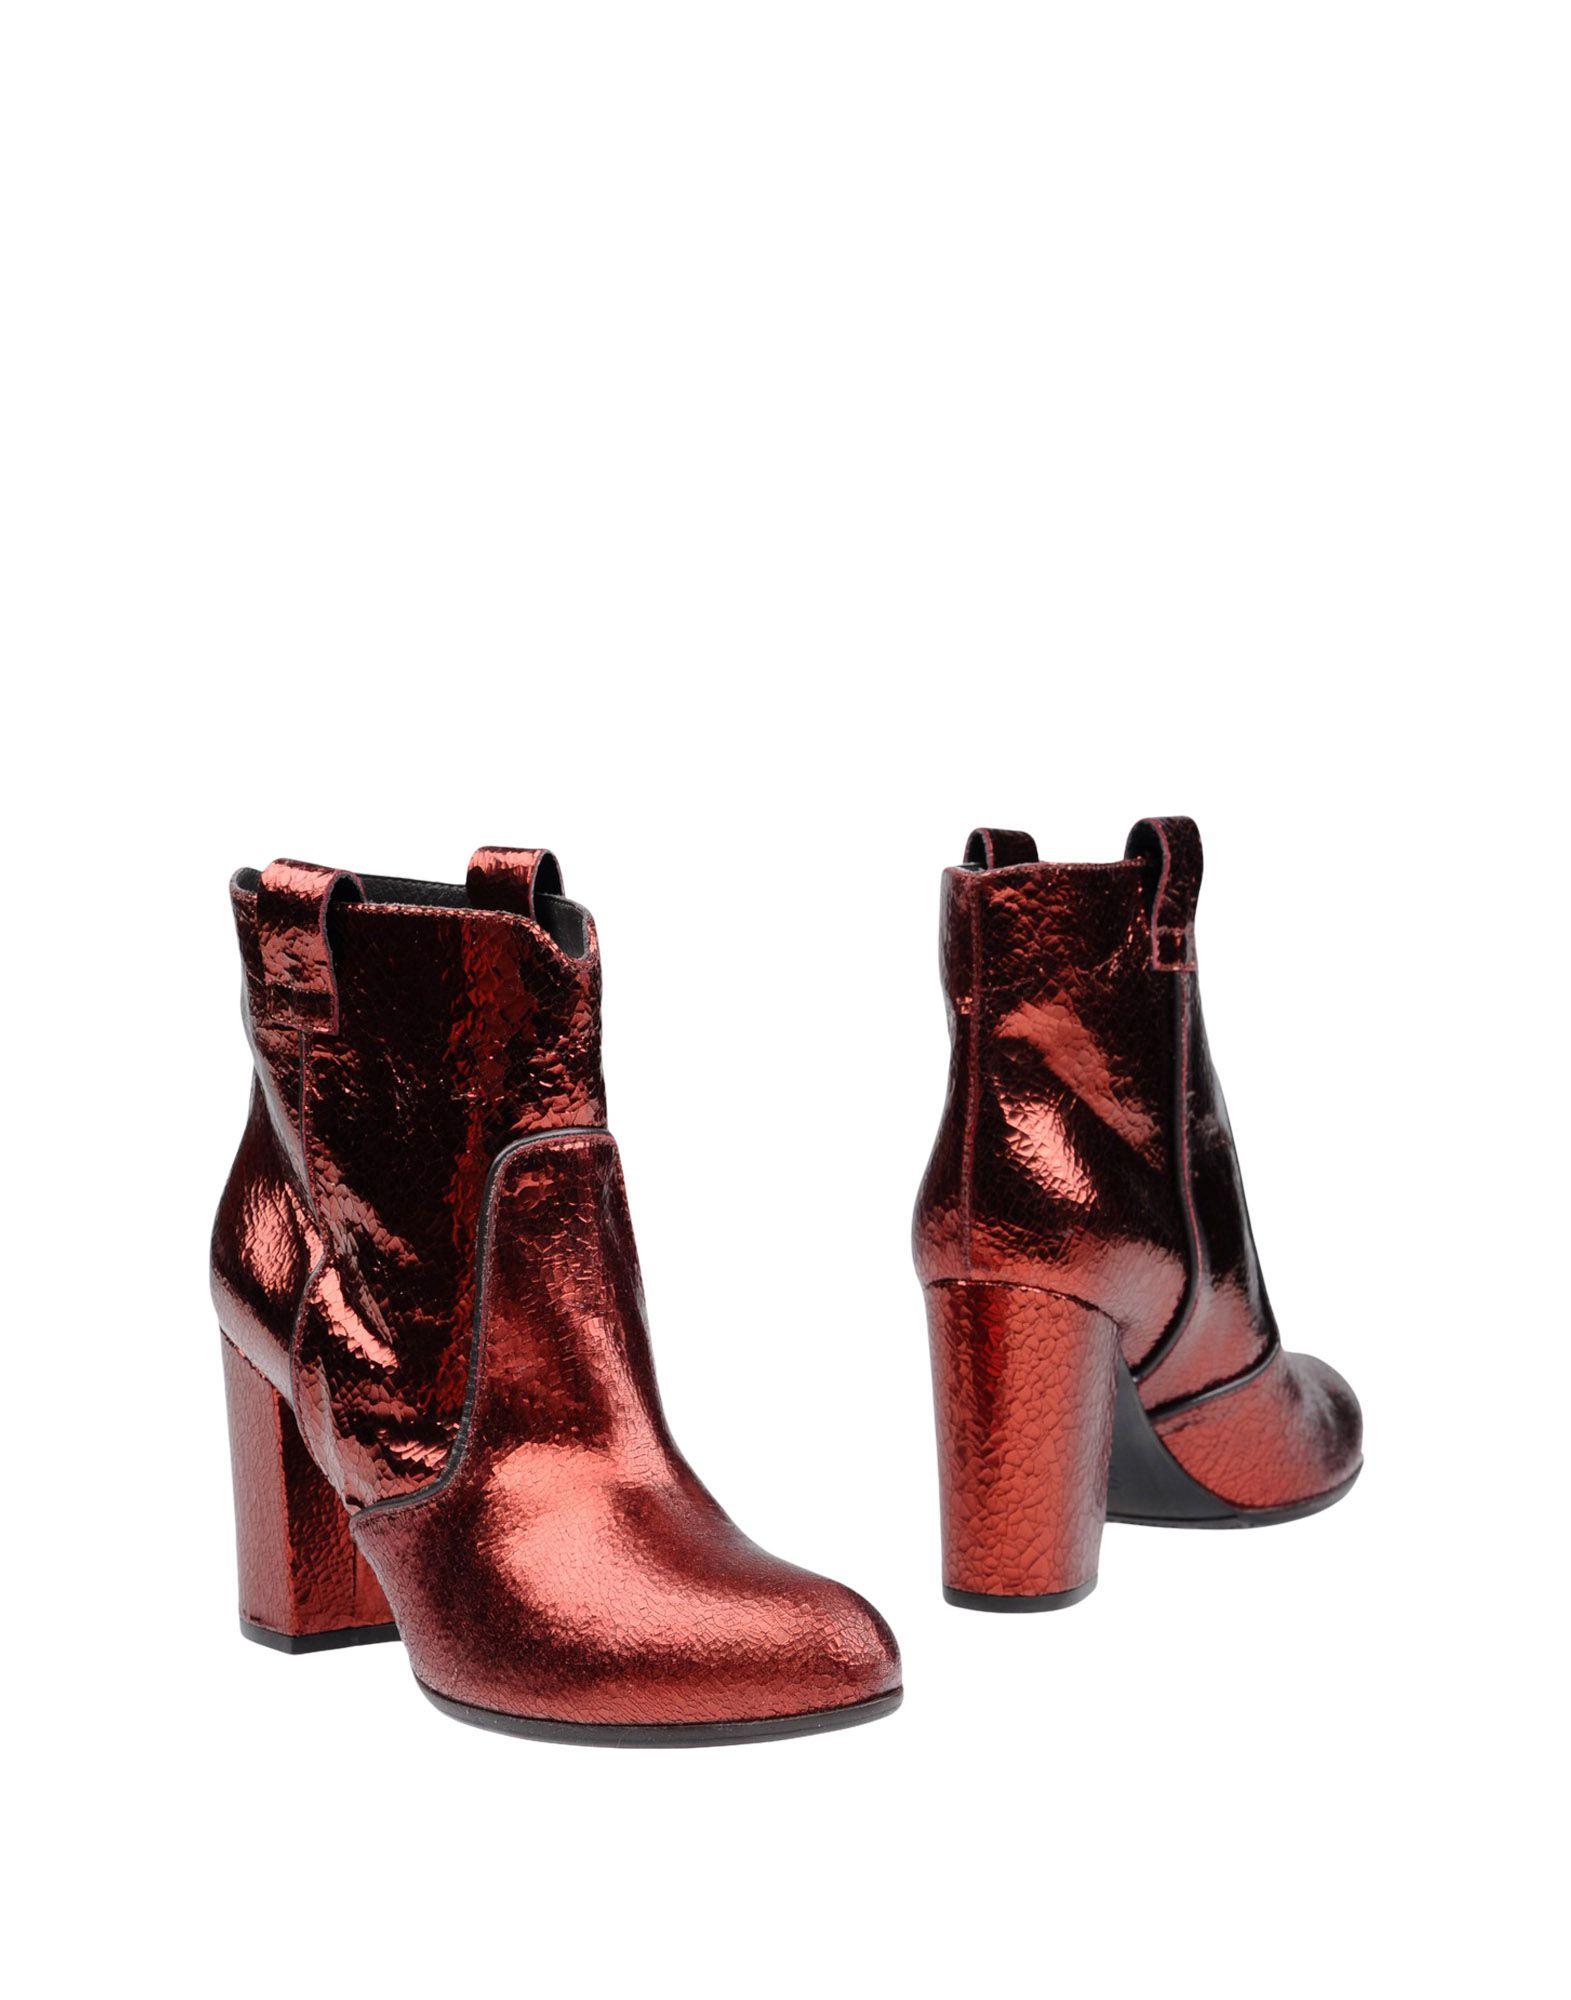 Paris Texas Stiefelette Qualität Damen  11244677UO Gute Qualität Stiefelette beliebte Schuhe 80a34d